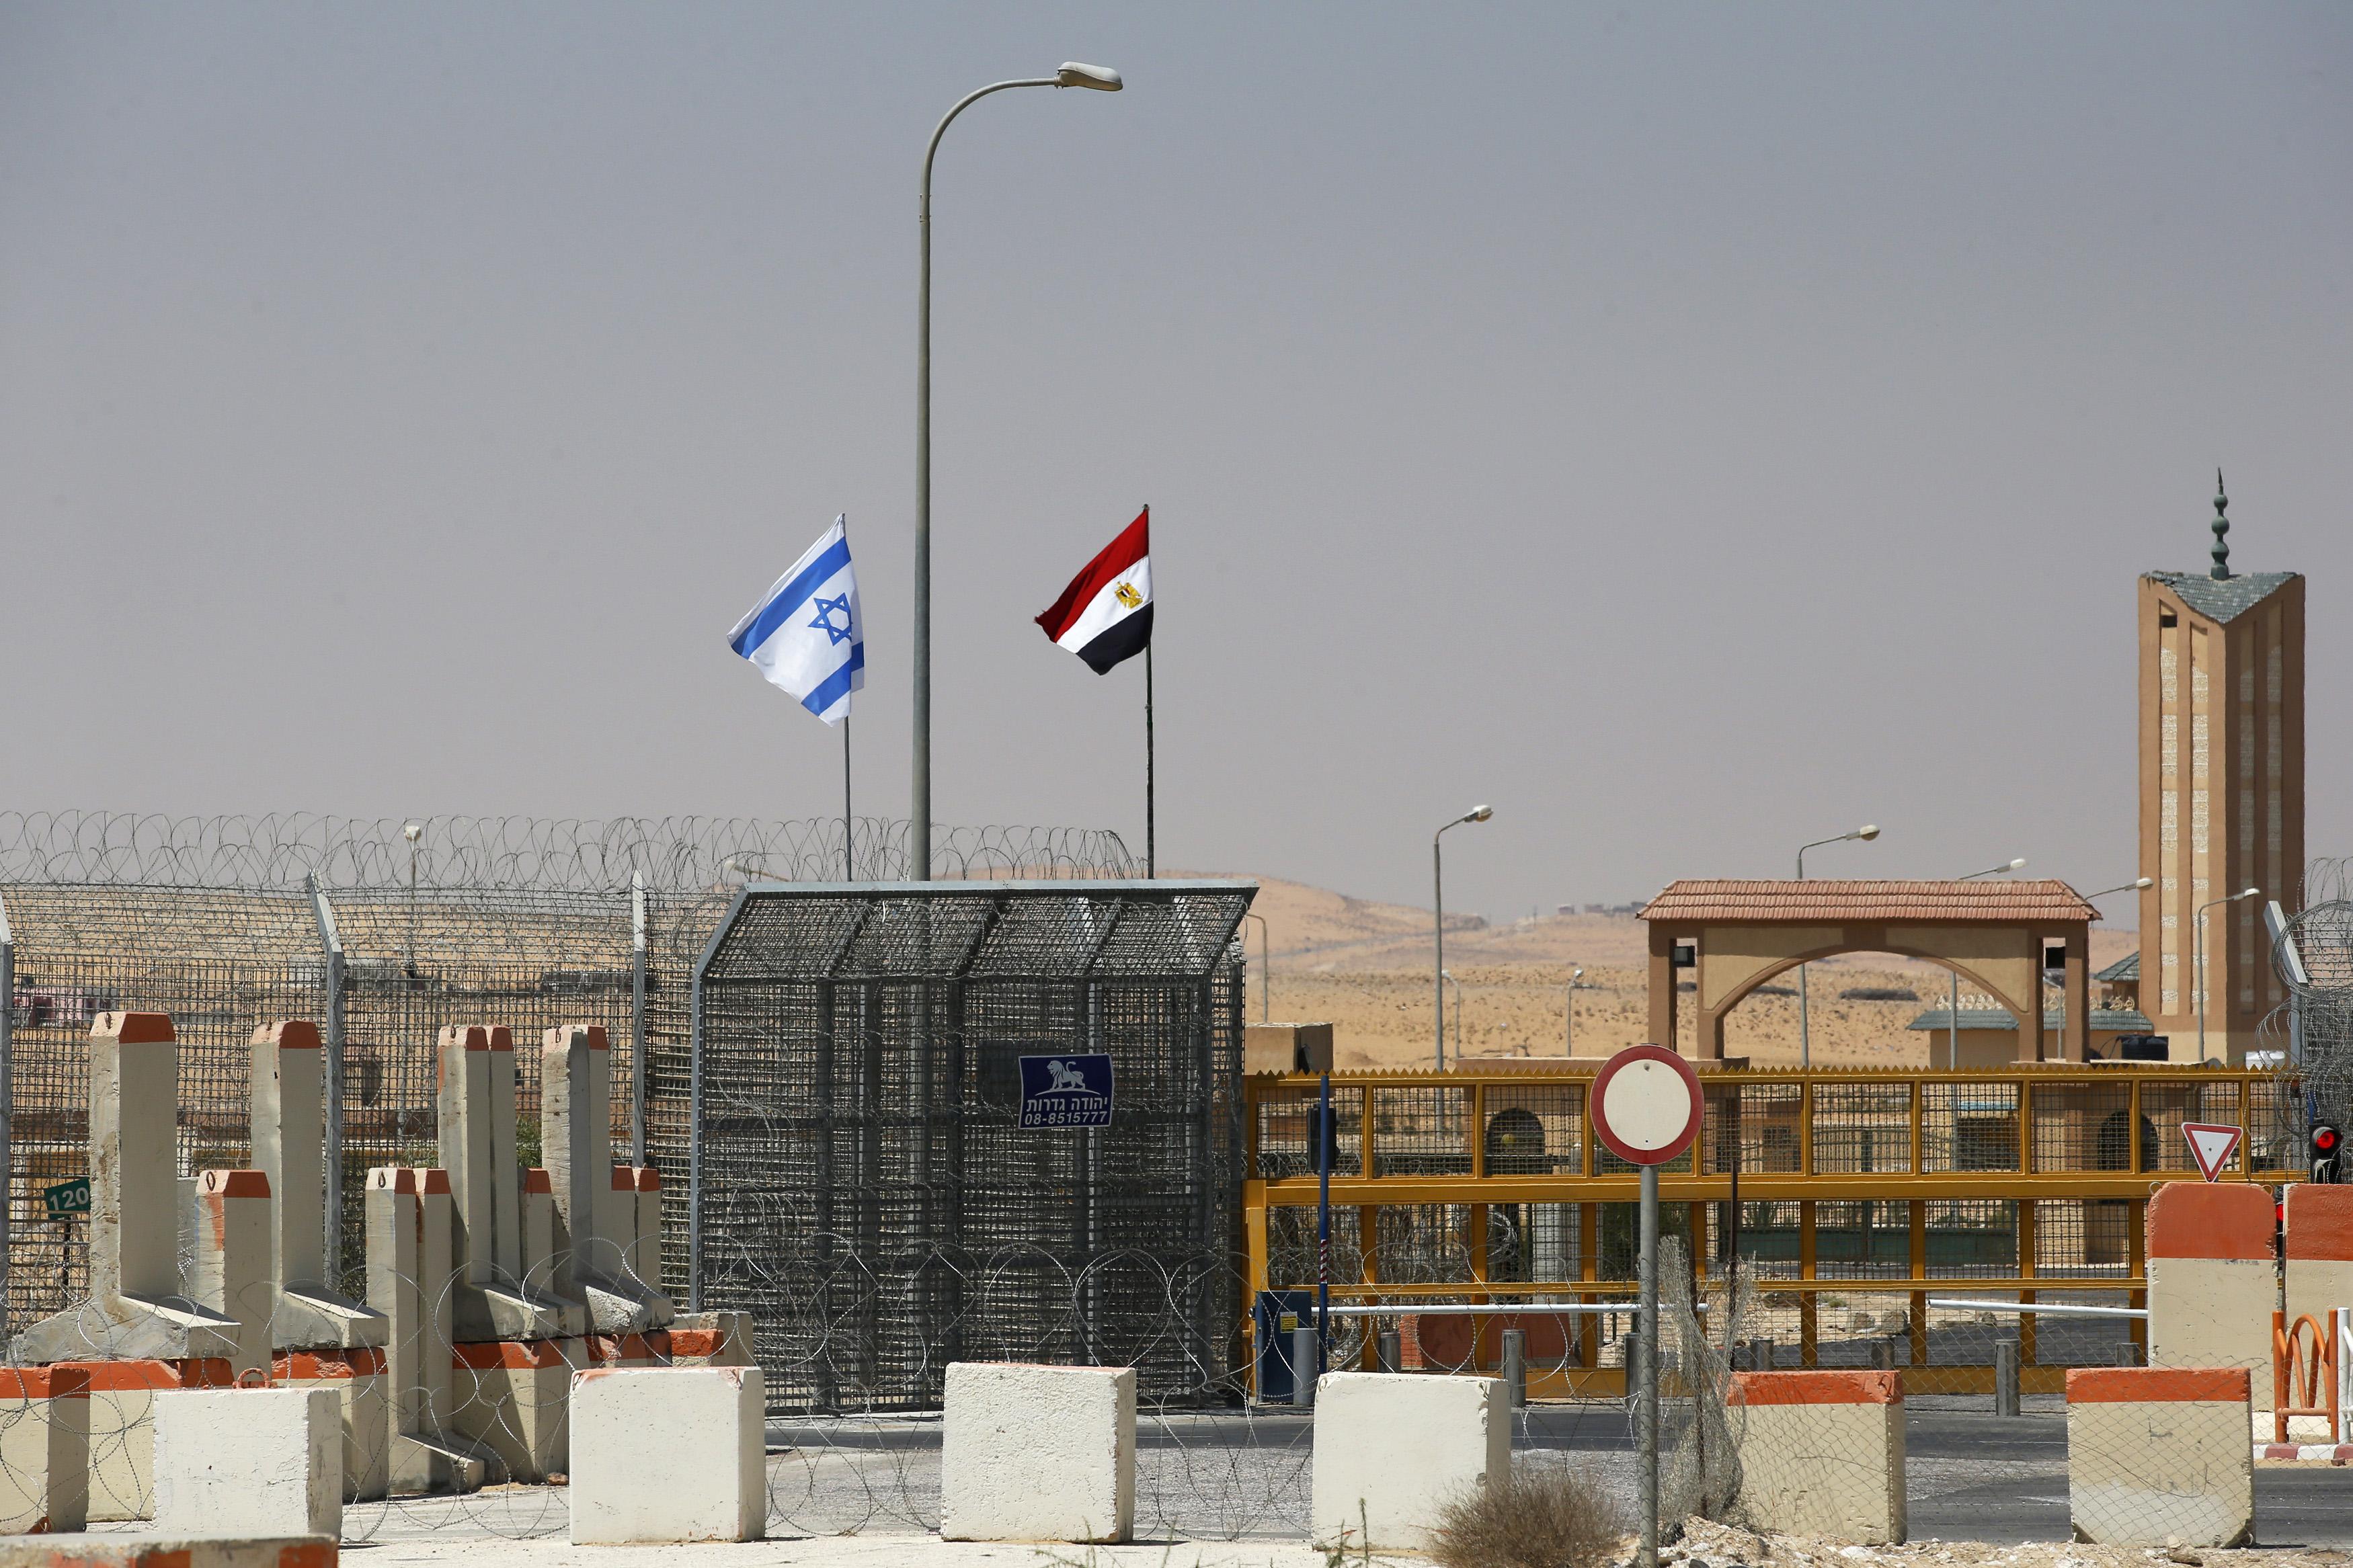 The Sinai Peninsula Threat Development and Response Concept